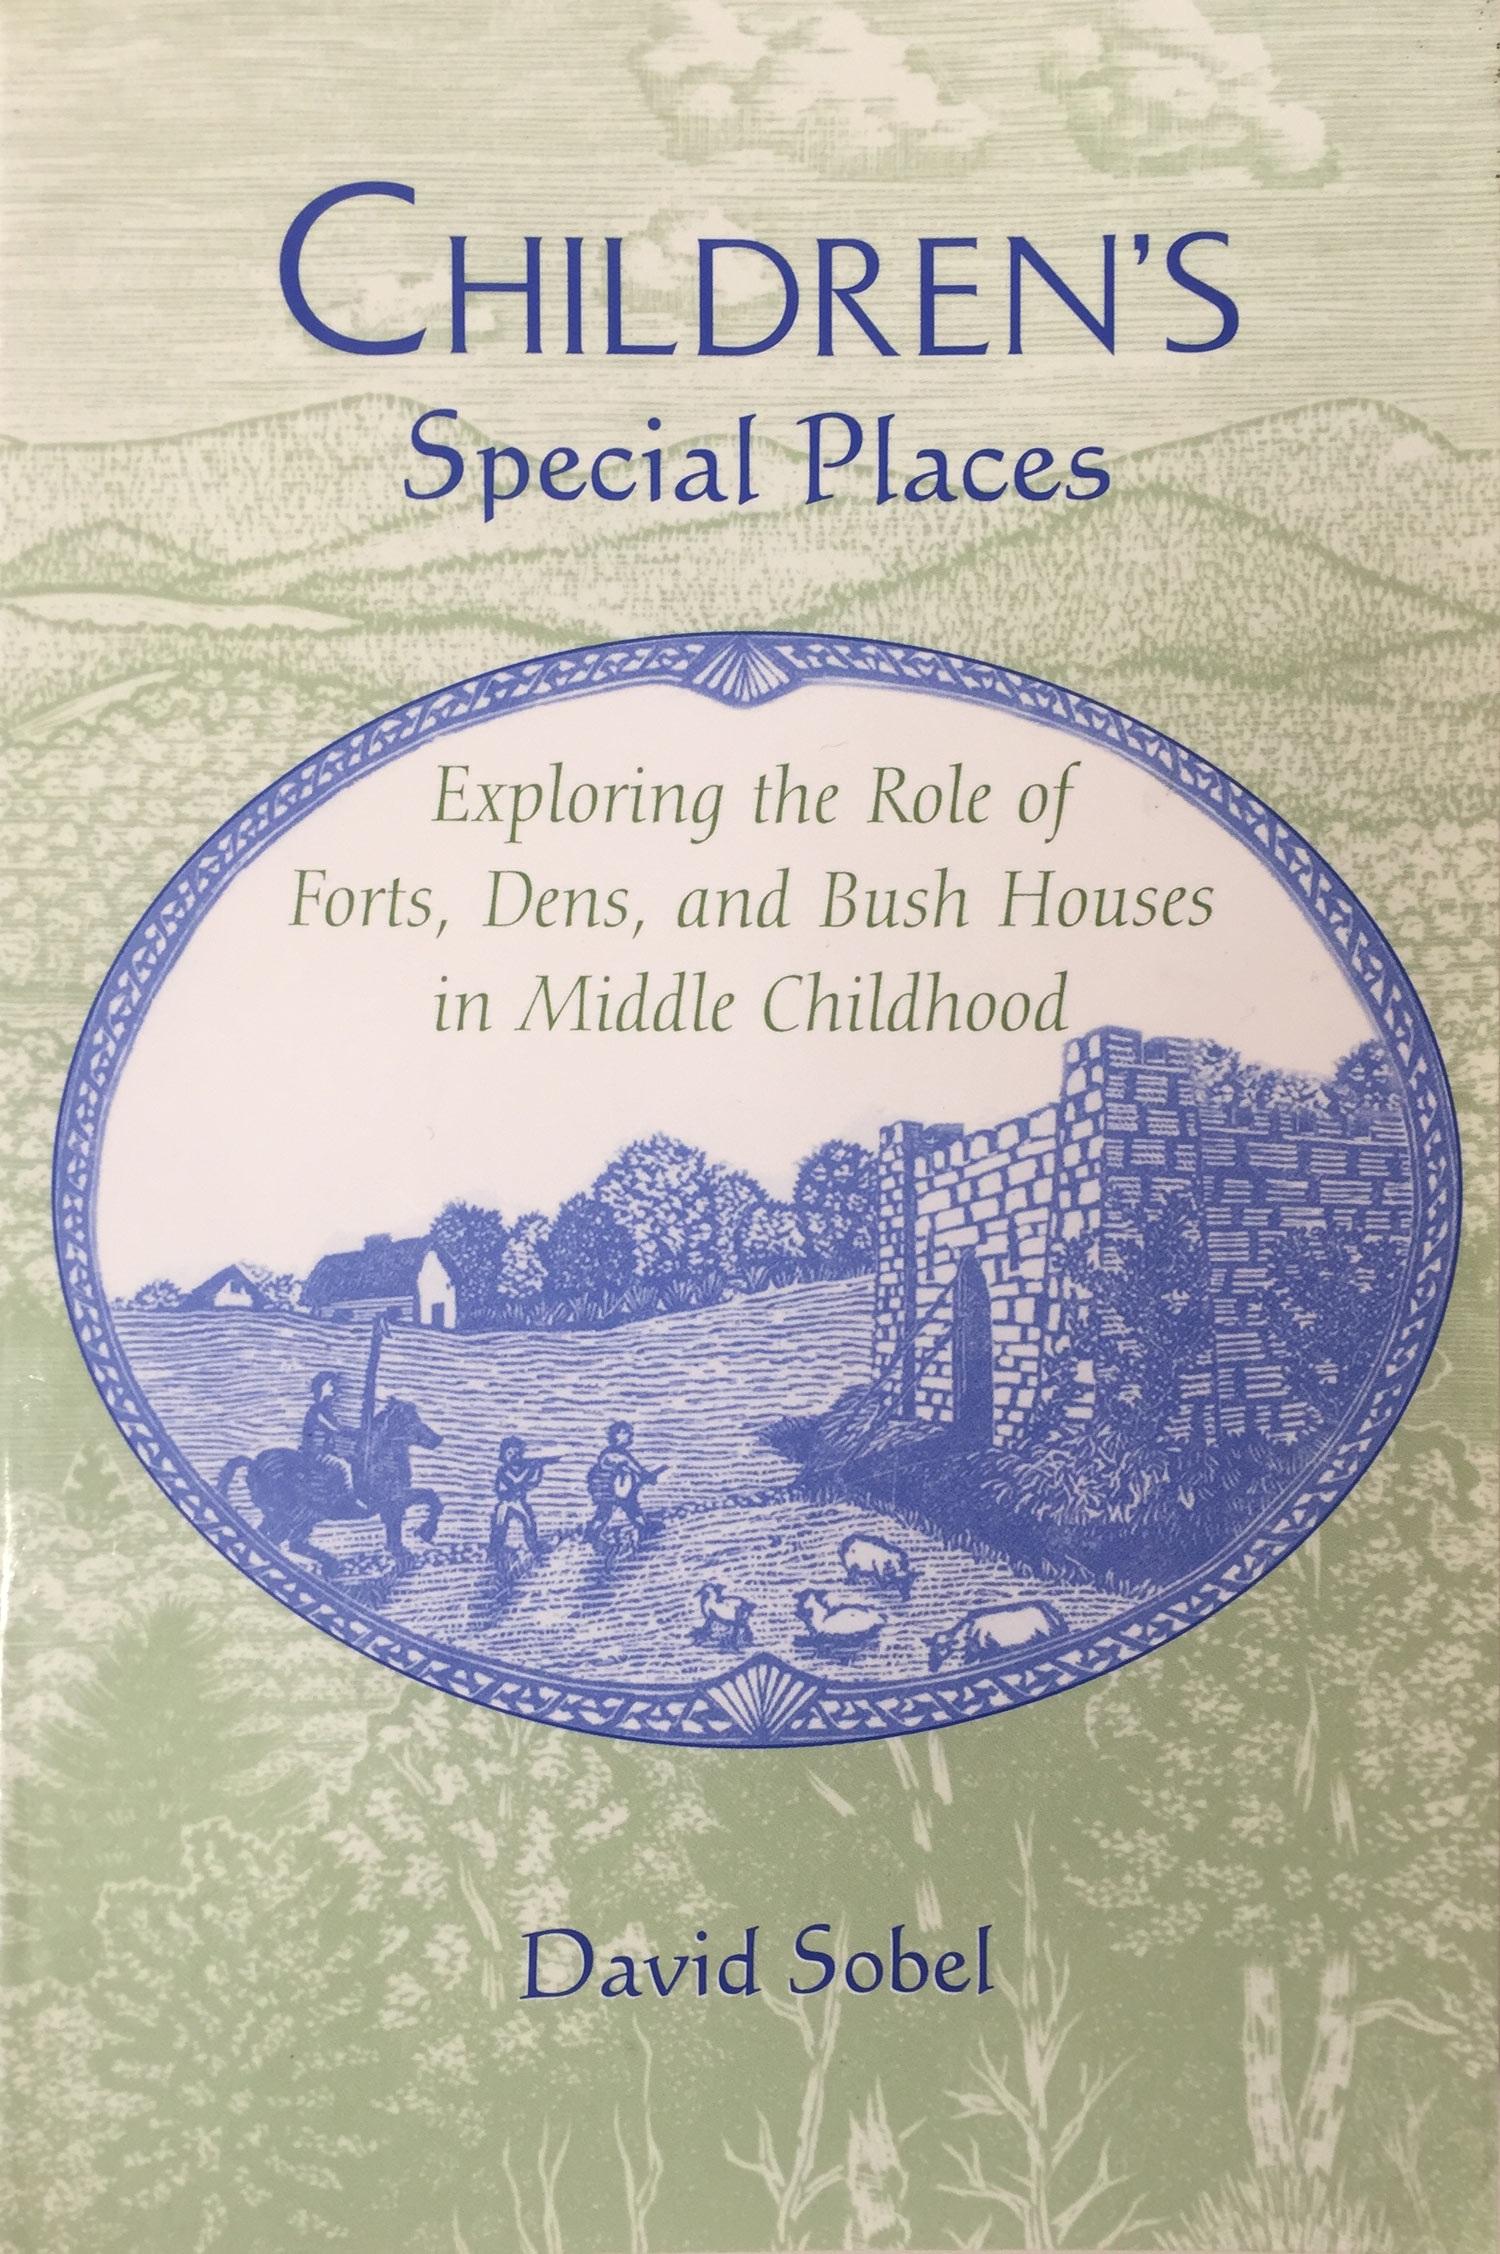 David-Sobel-Chidrens-Special-Places-for-Web.jpg